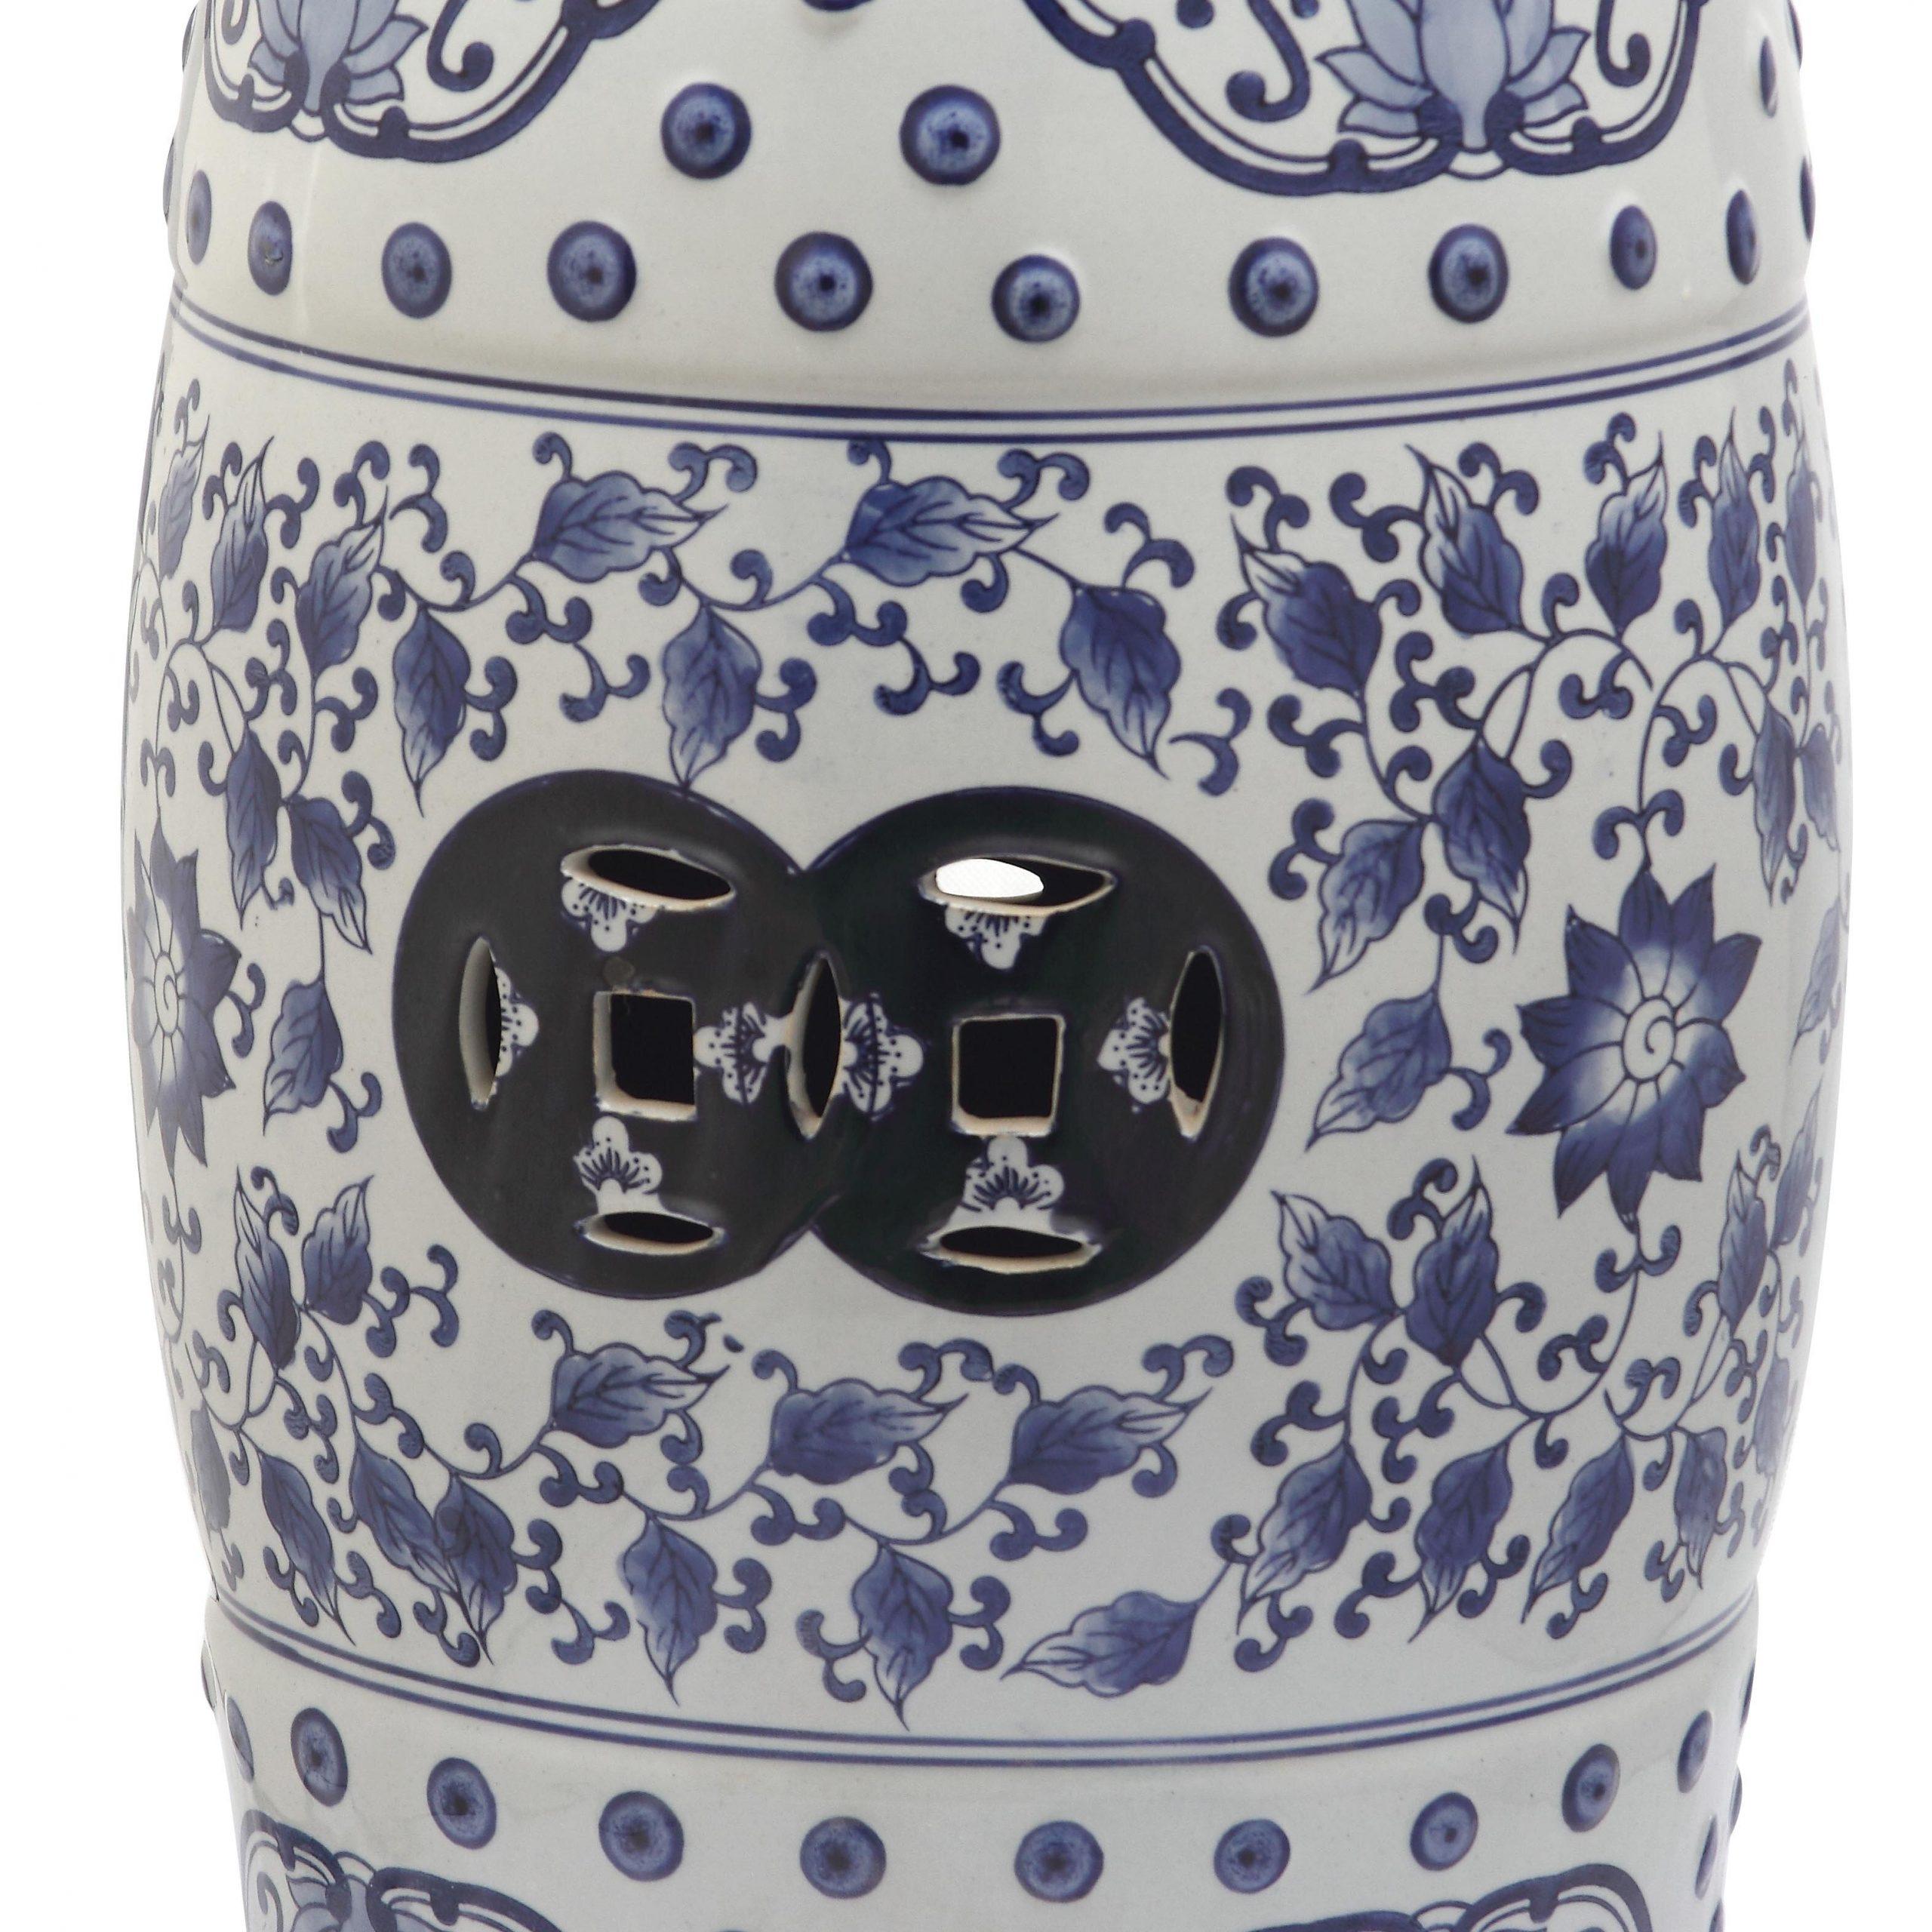 Blue Ceramic Garden Stools You'Ll Love In 2020   Wayfair In Kujawa Ceramic Garden Stools (View 6 of 25)